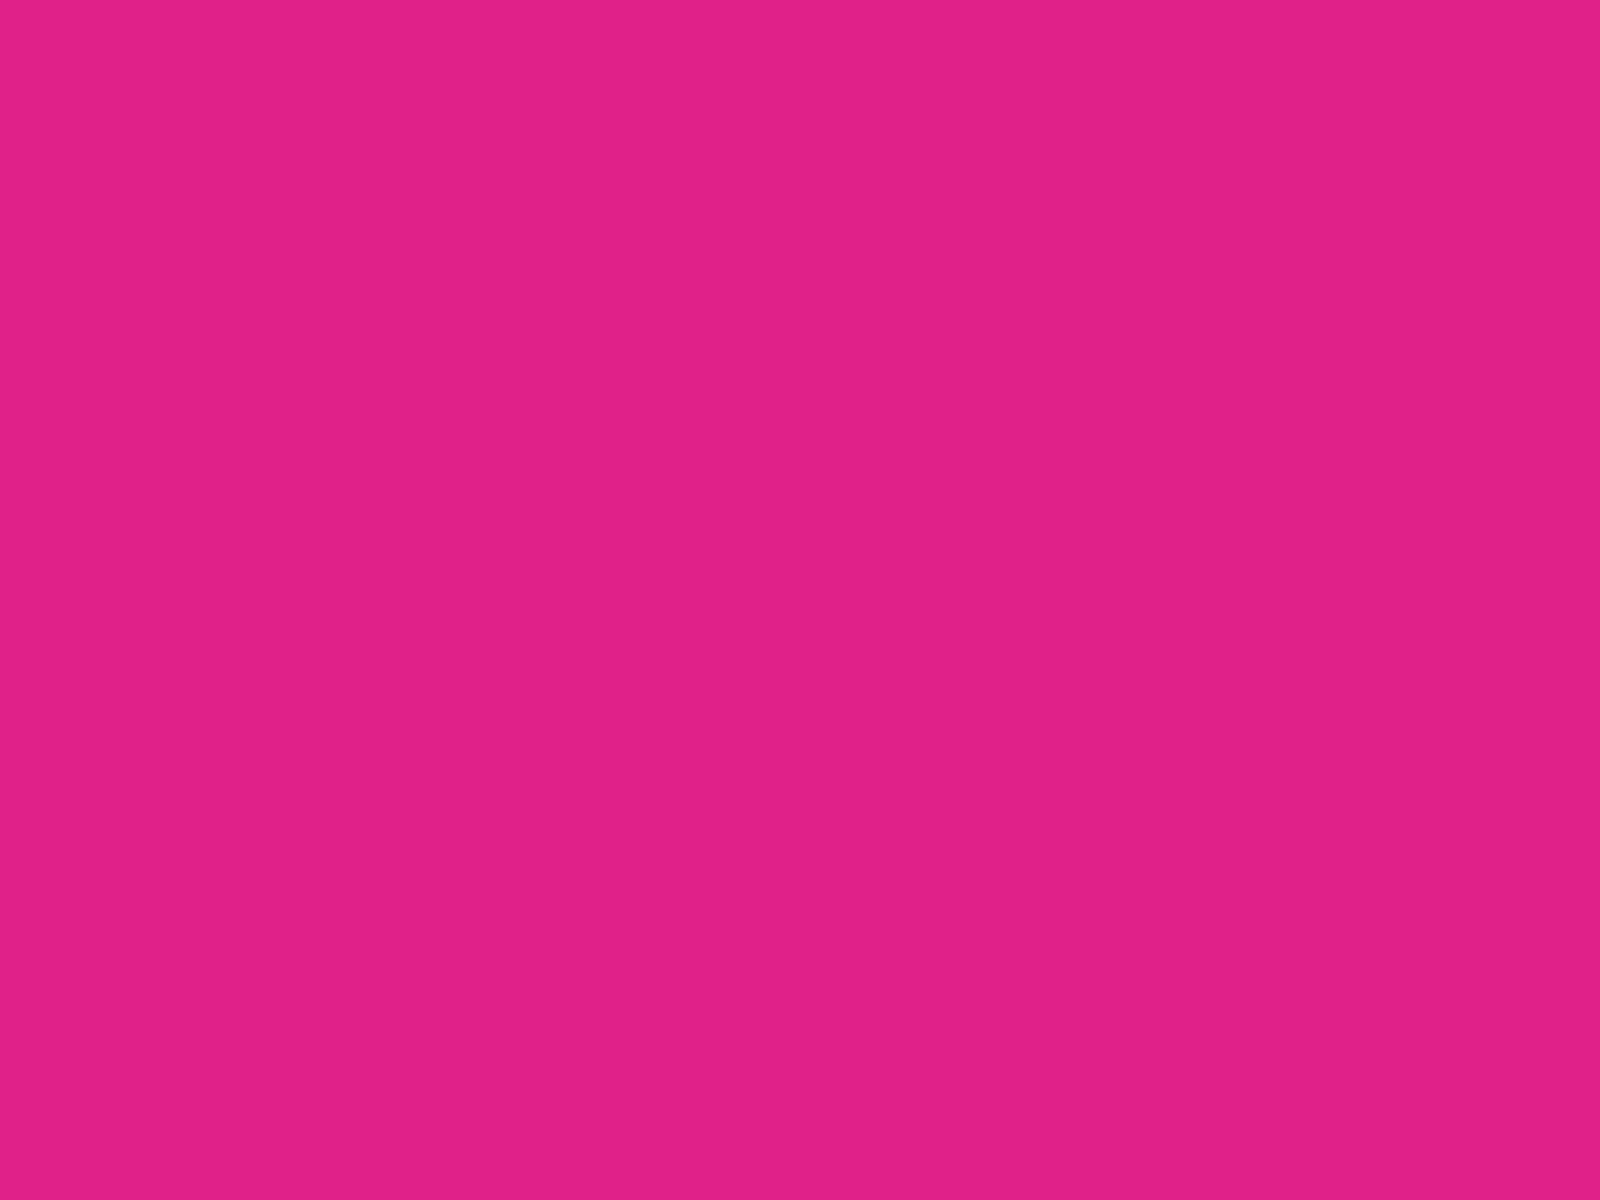 1600x1200 Barbie Pink Solid Color Background